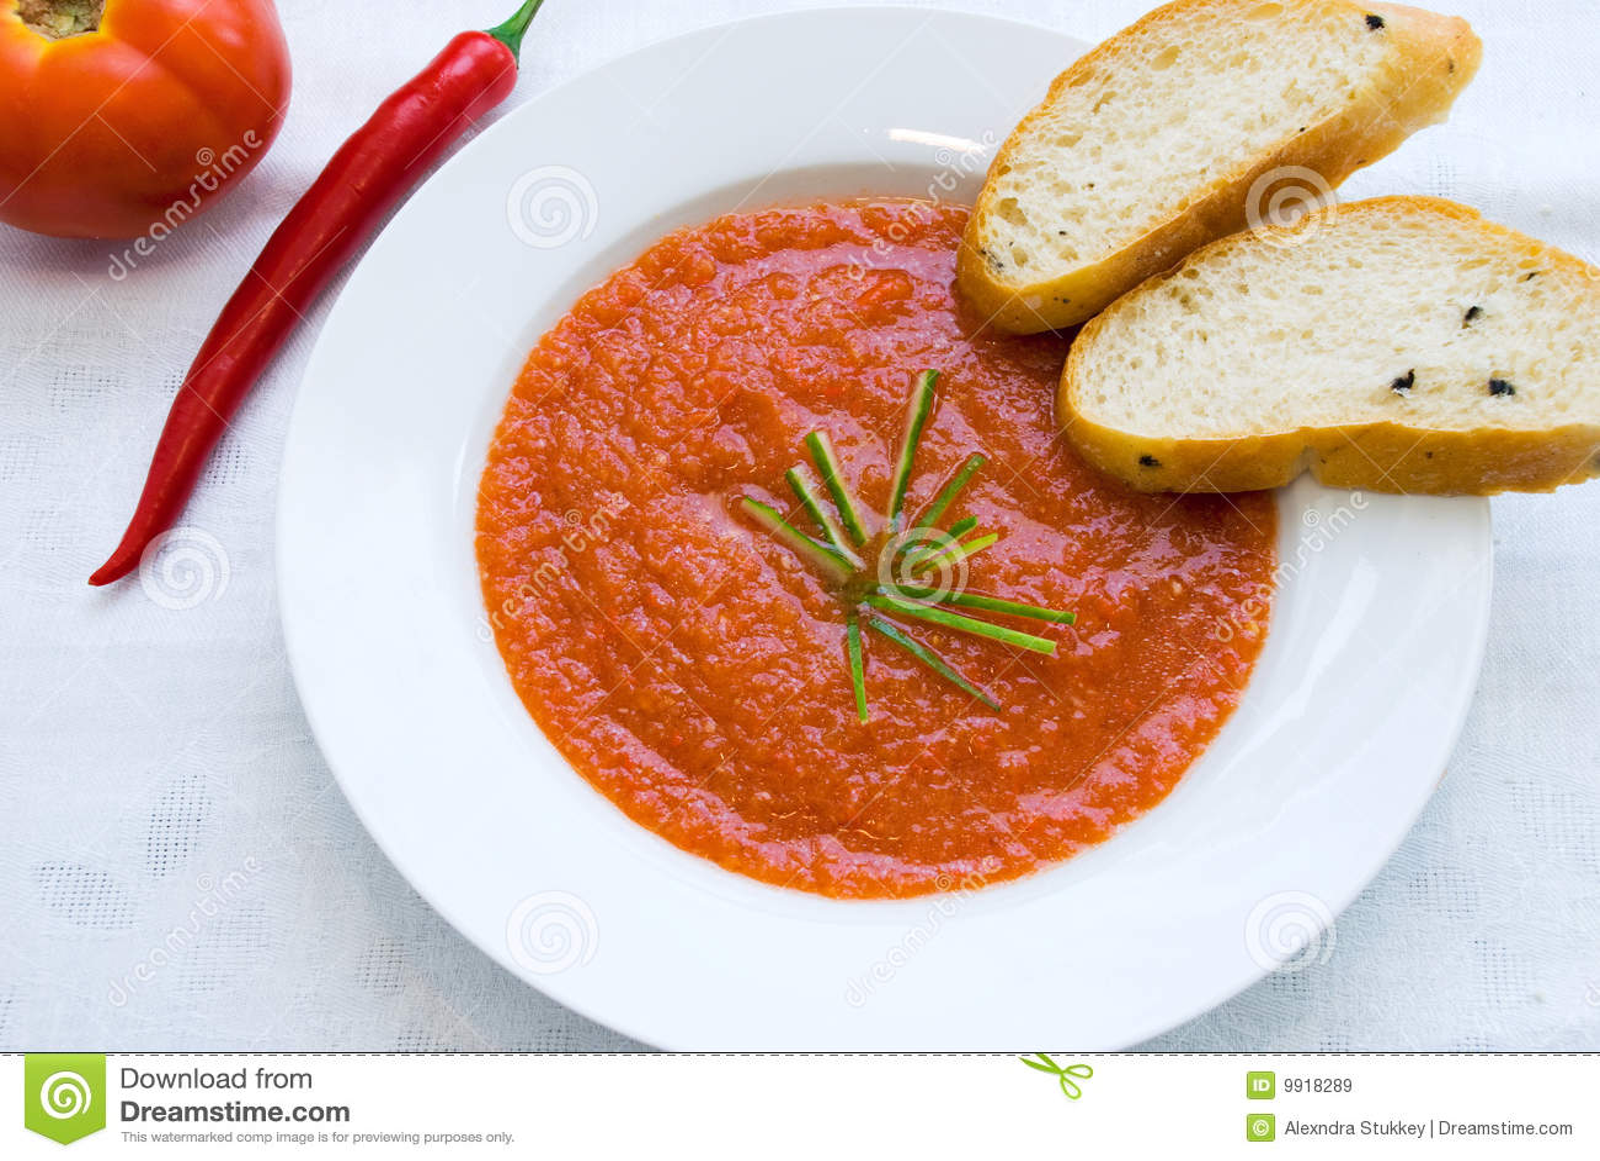 potage espagnol de tomate image stock image du assiette 9918289. Black Bedroom Furniture Sets. Home Design Ideas